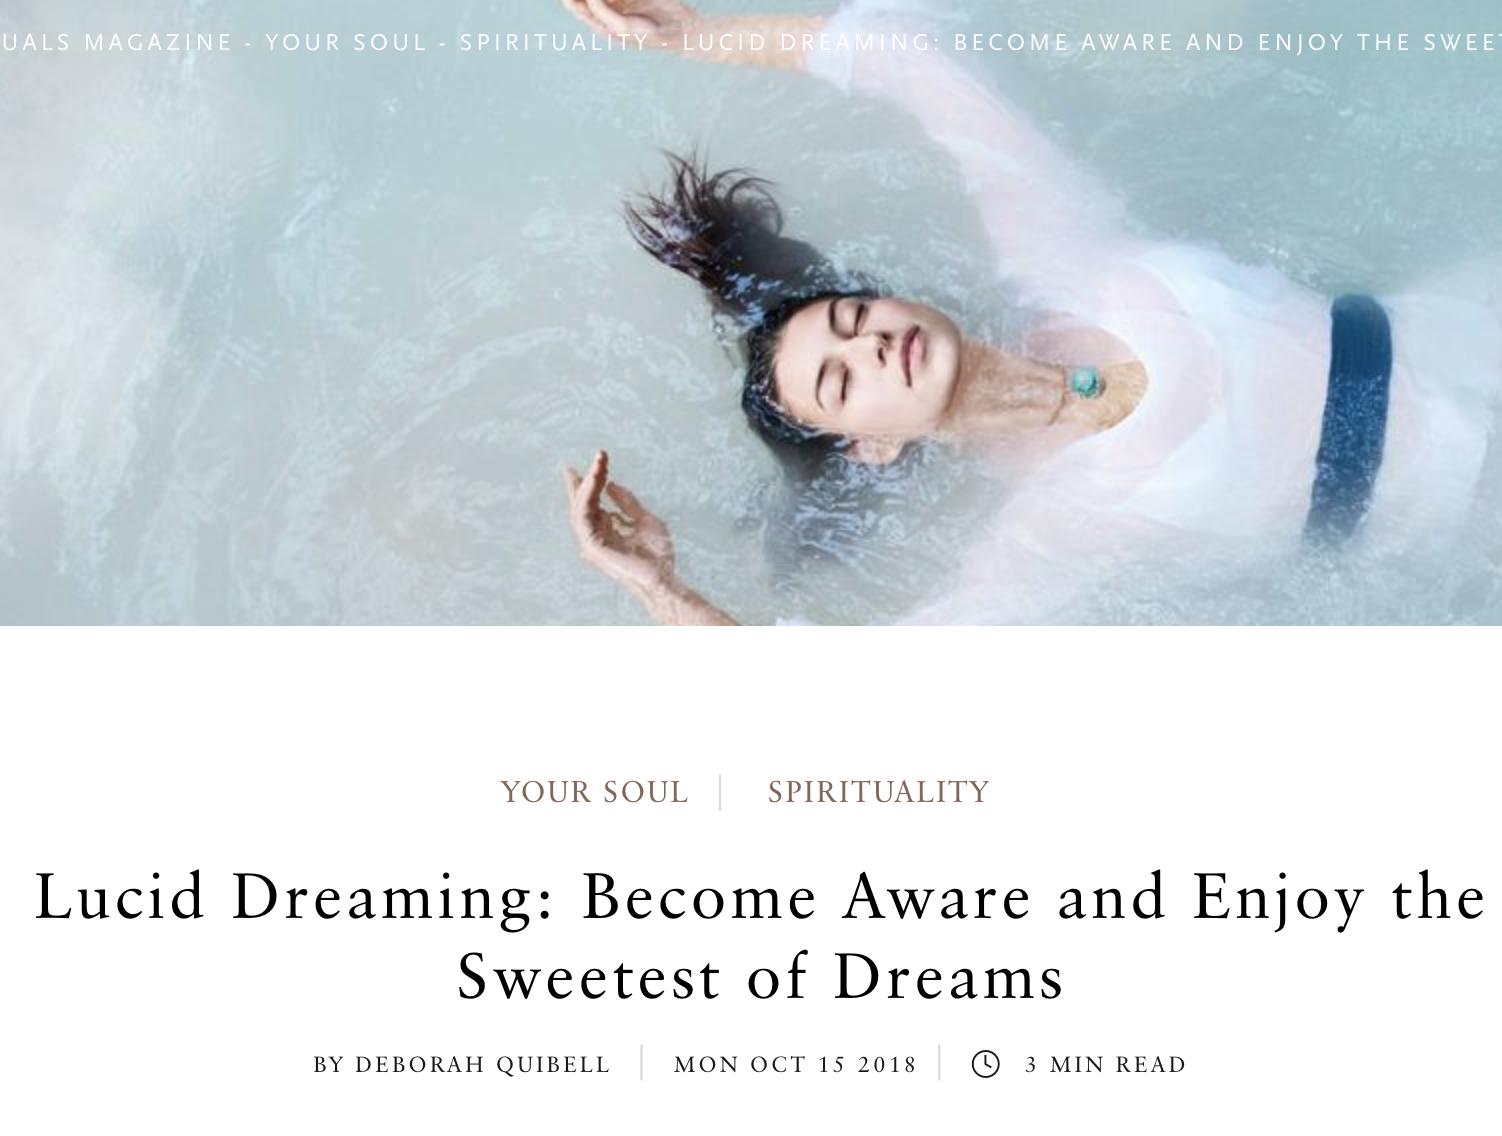 On Lucid Dreaming